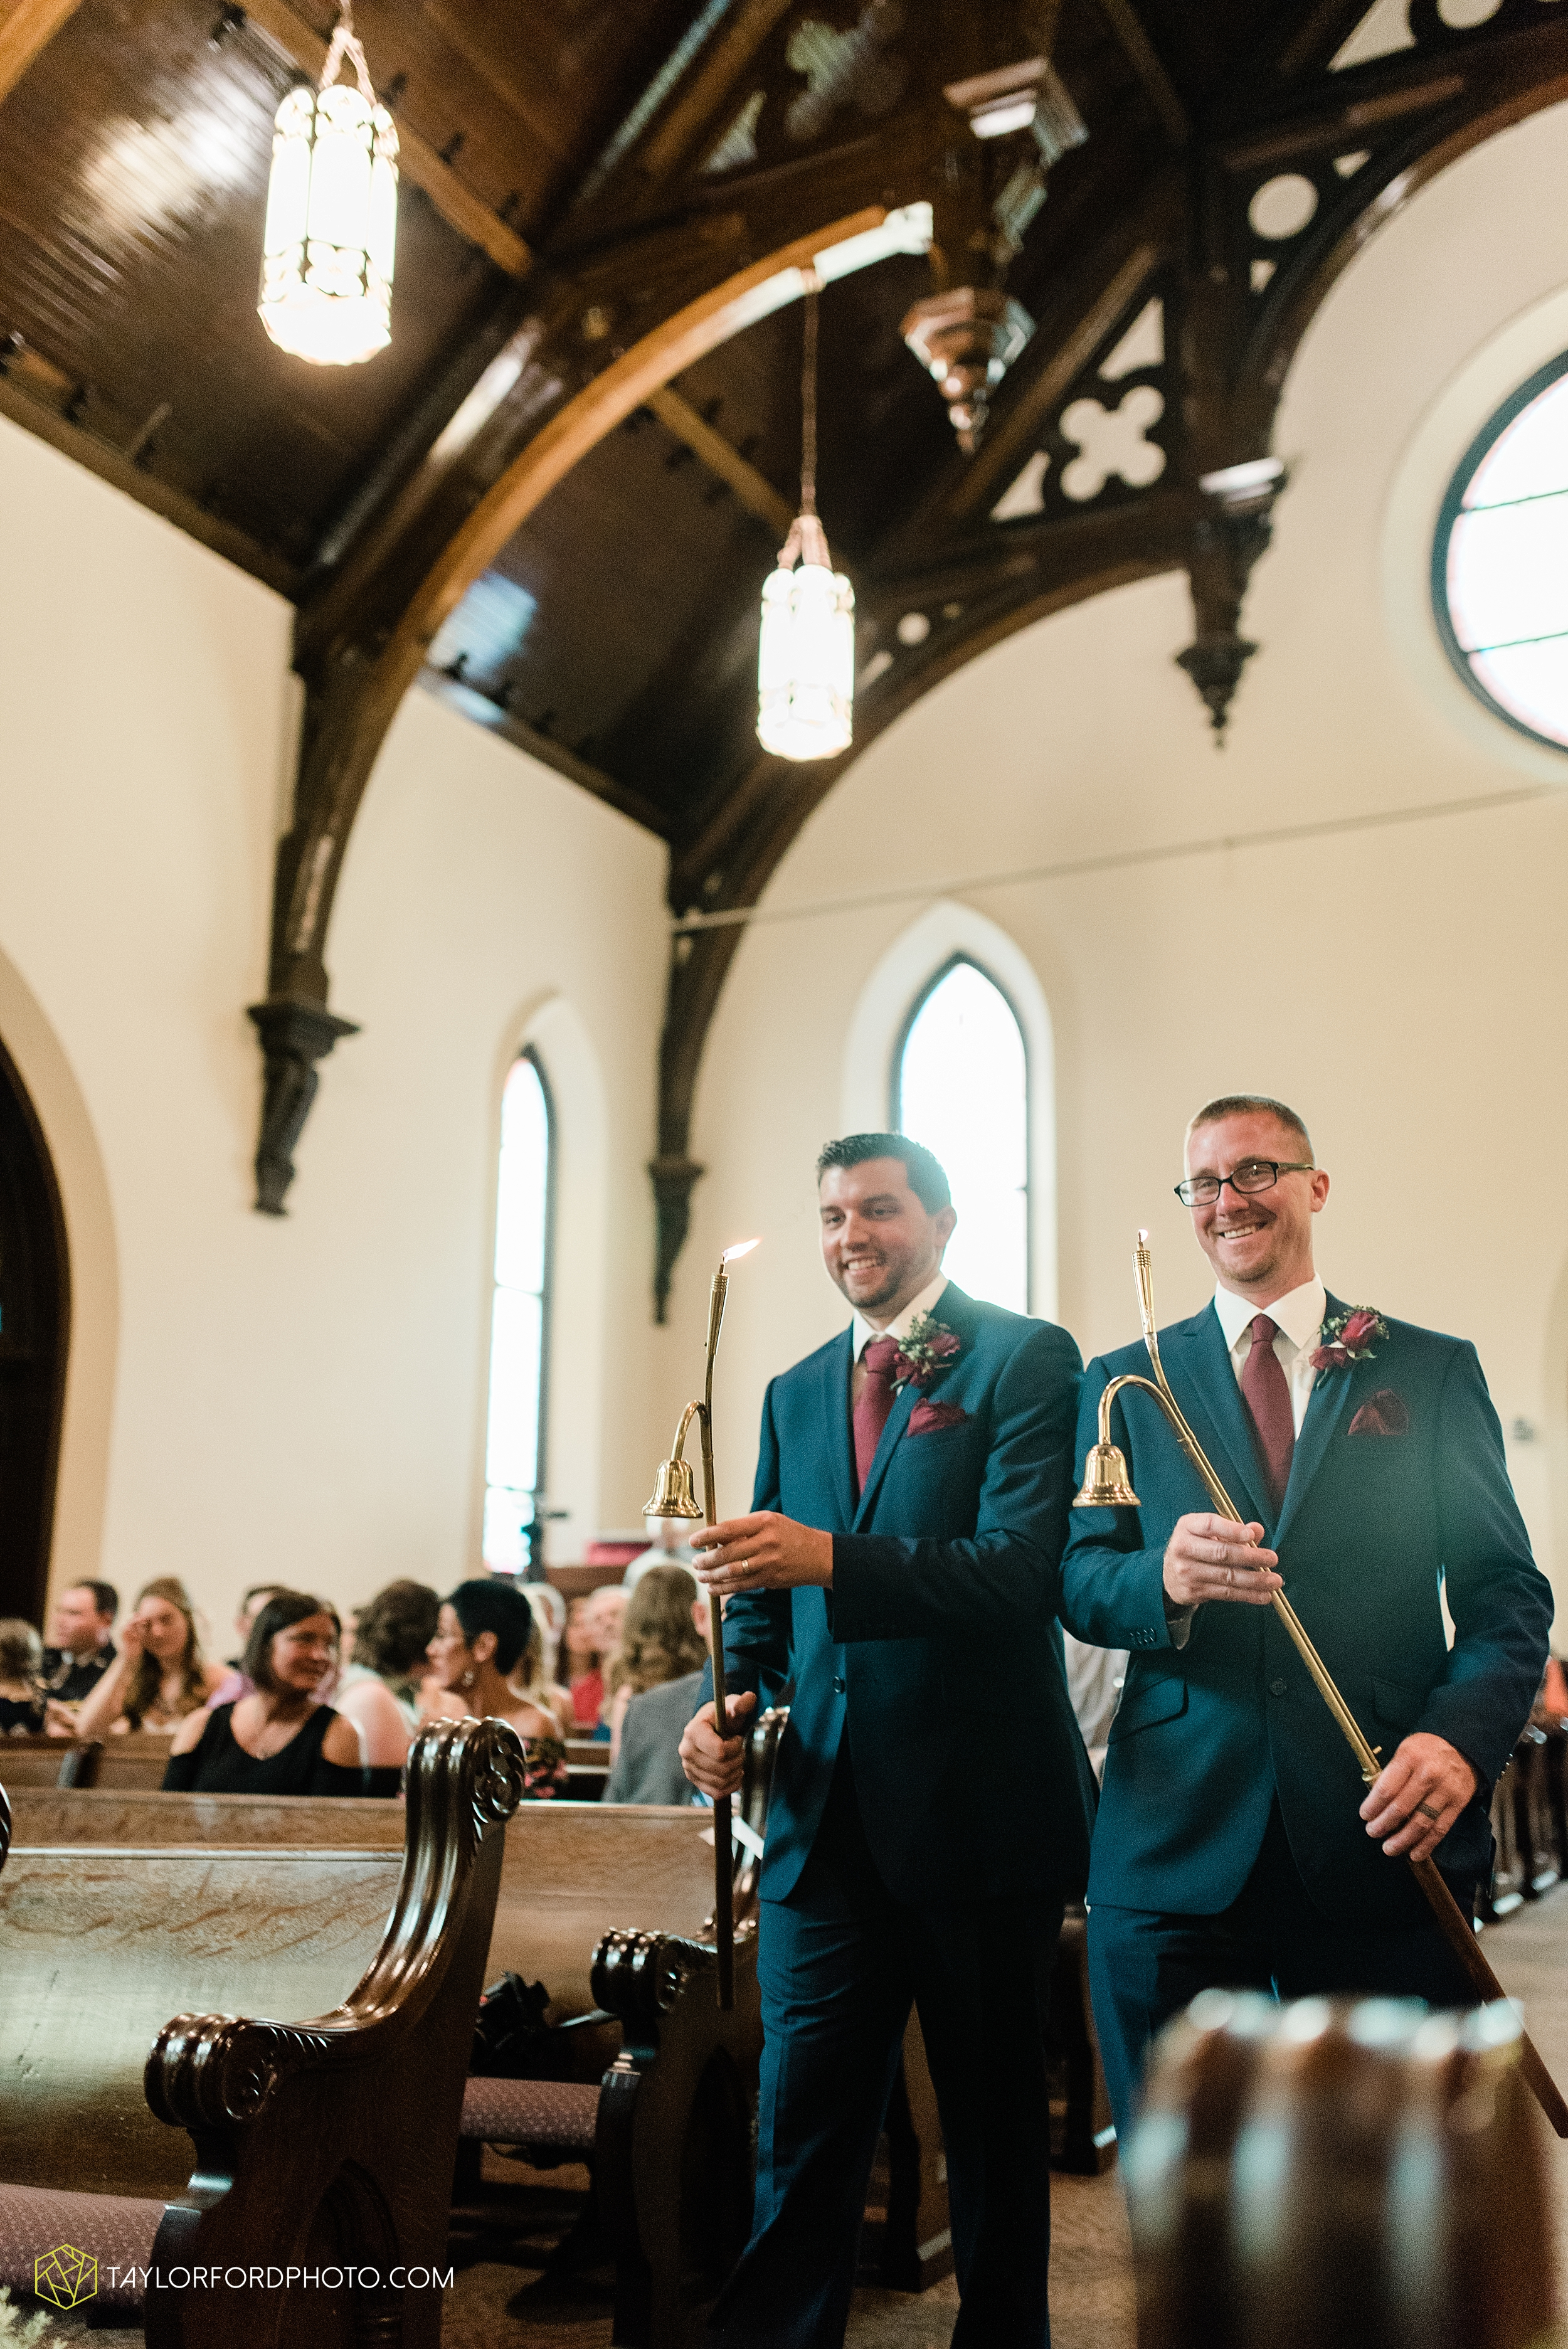 van-wert-ohio-first-united-methodist-church-county-dairy-barn-wedding-photographer-taylor-ford-photography_9822.jpg